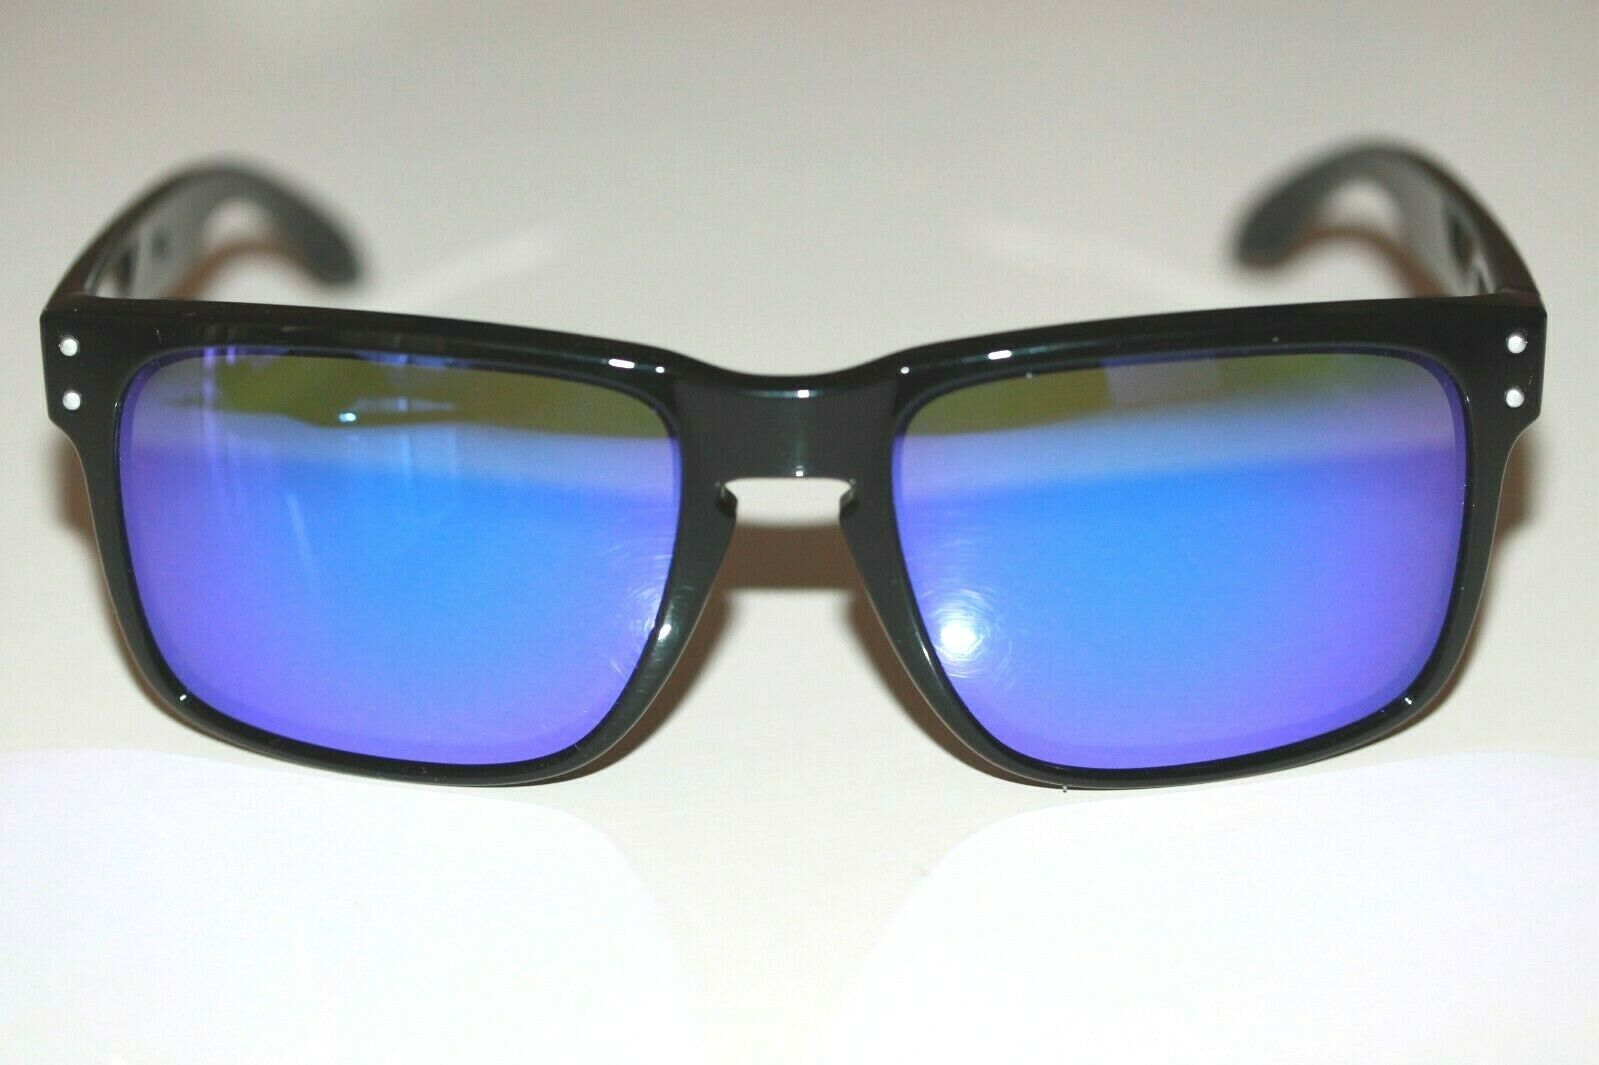 b20c7442ee148 Custom Oakley Holbrook Sunglasses Polished Black Ink W  Violet Iridium Lens